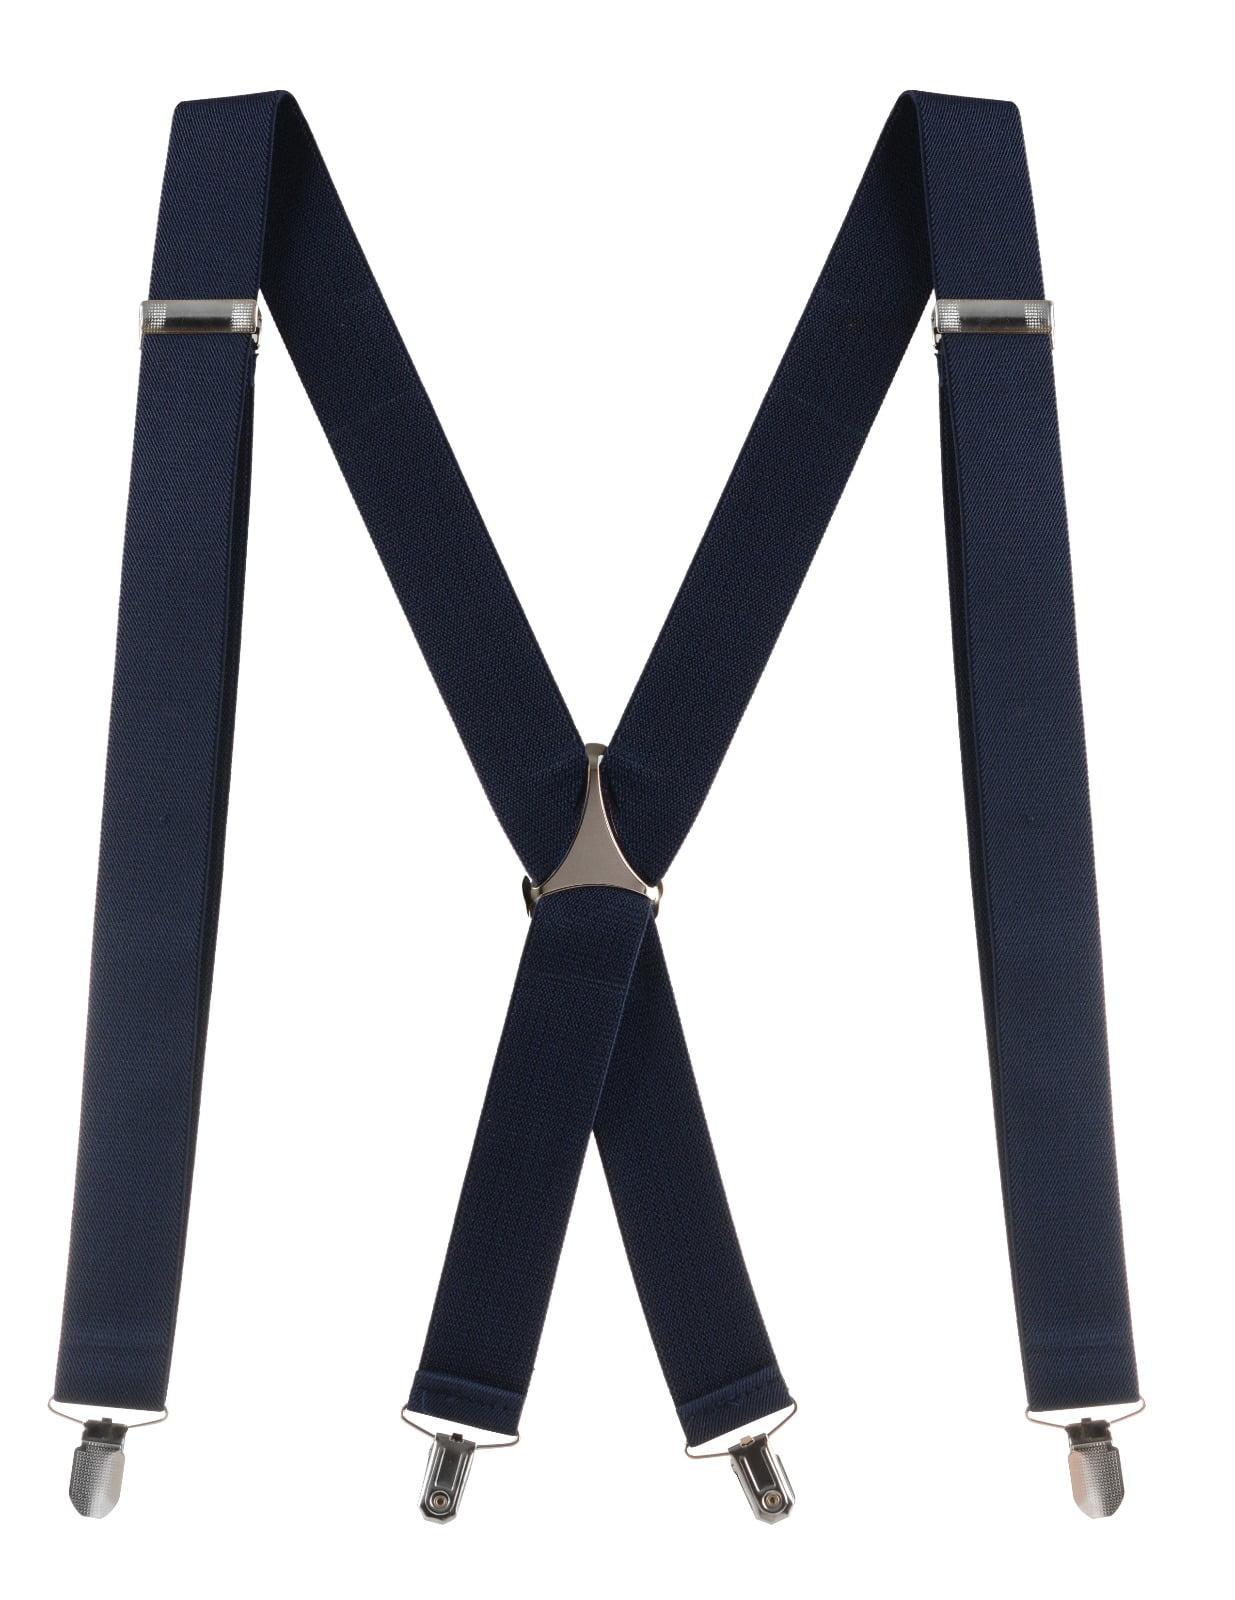 Buyless Fashion Mens 48 Elastic Adjustable 1 1/2 Suspenders In X Shape  Black